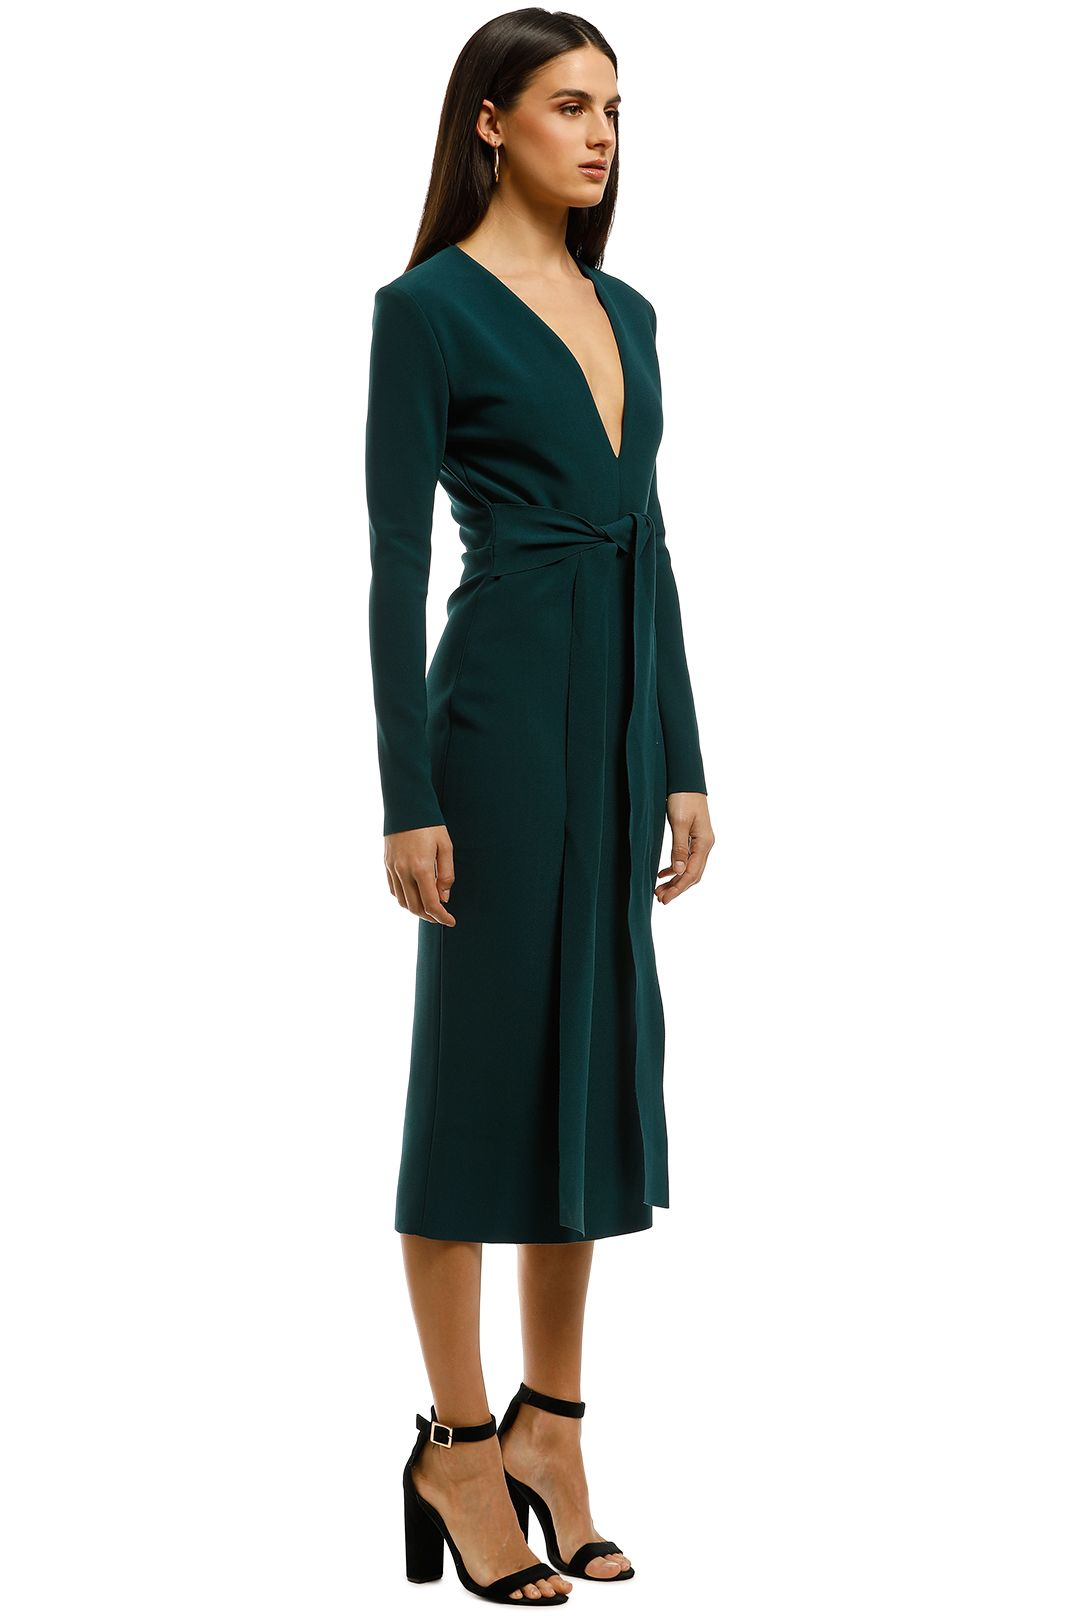 Bec+Bridge-Tasha-LS-Midi-Dress-Emerald-Side